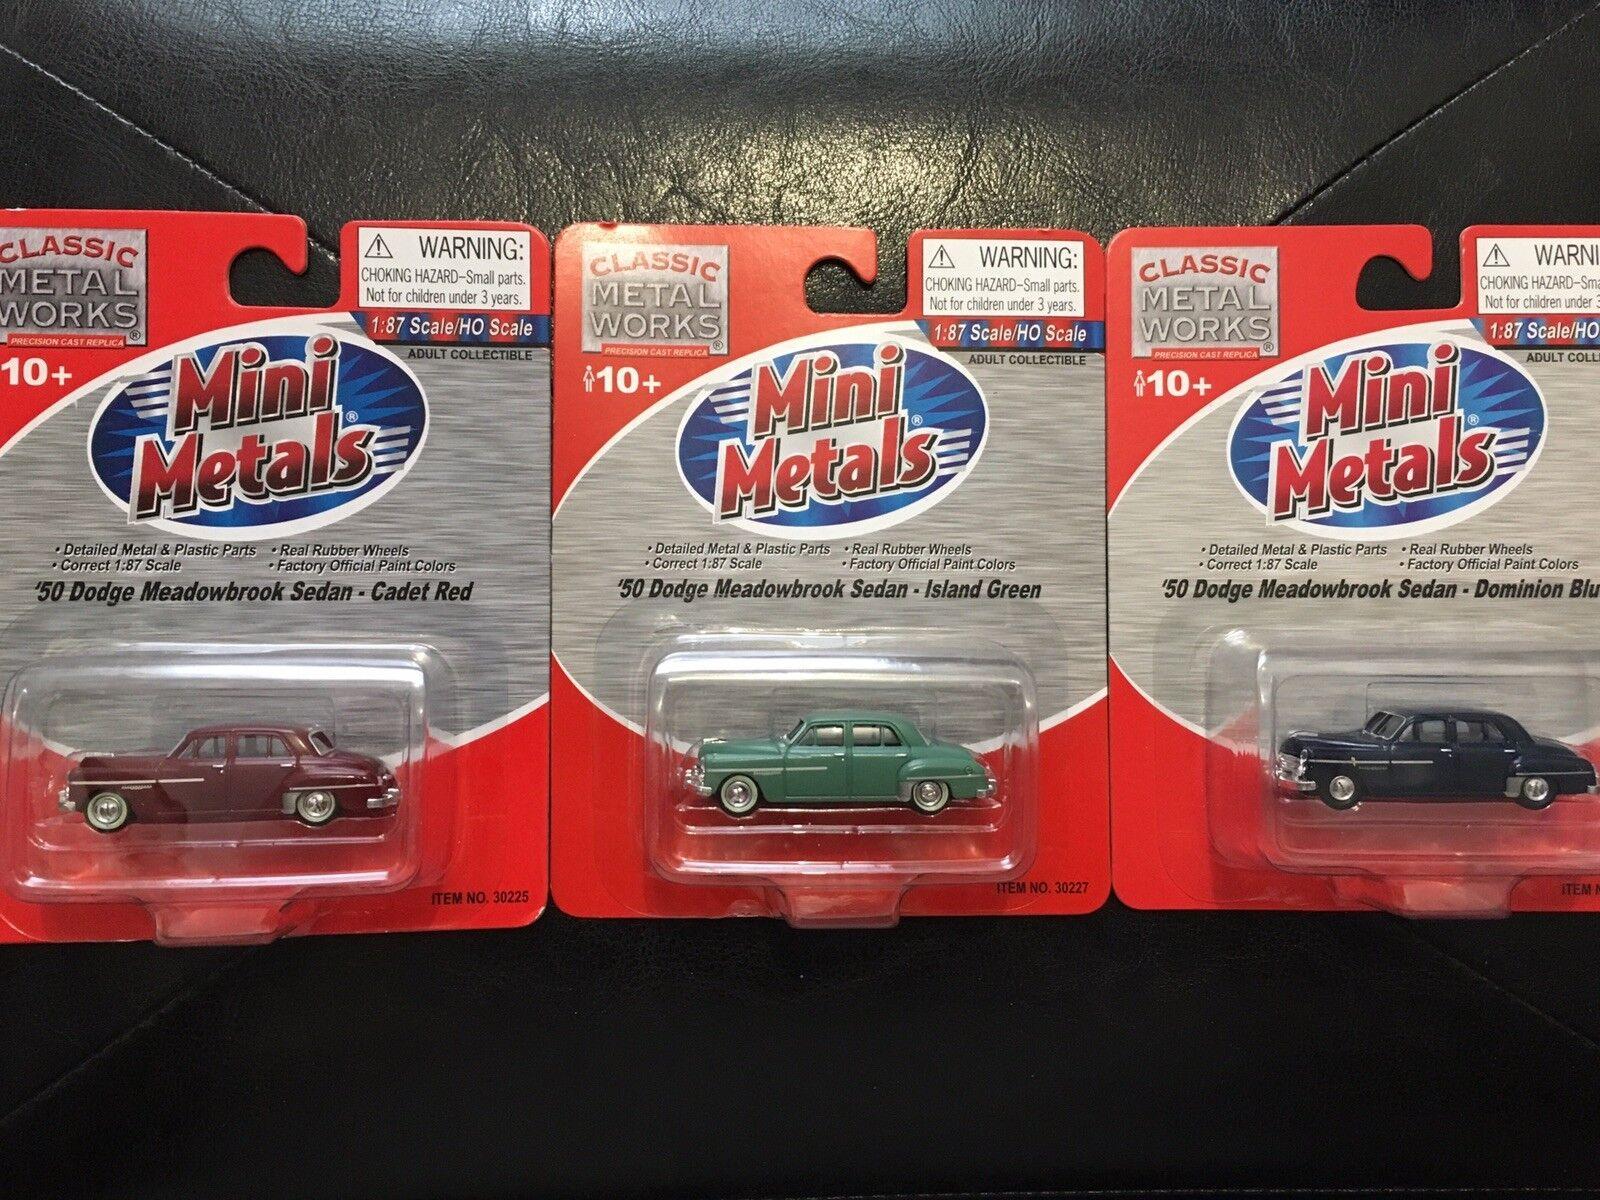 Viele  50 dodge meadowbrook limousine 30225 30227 30248